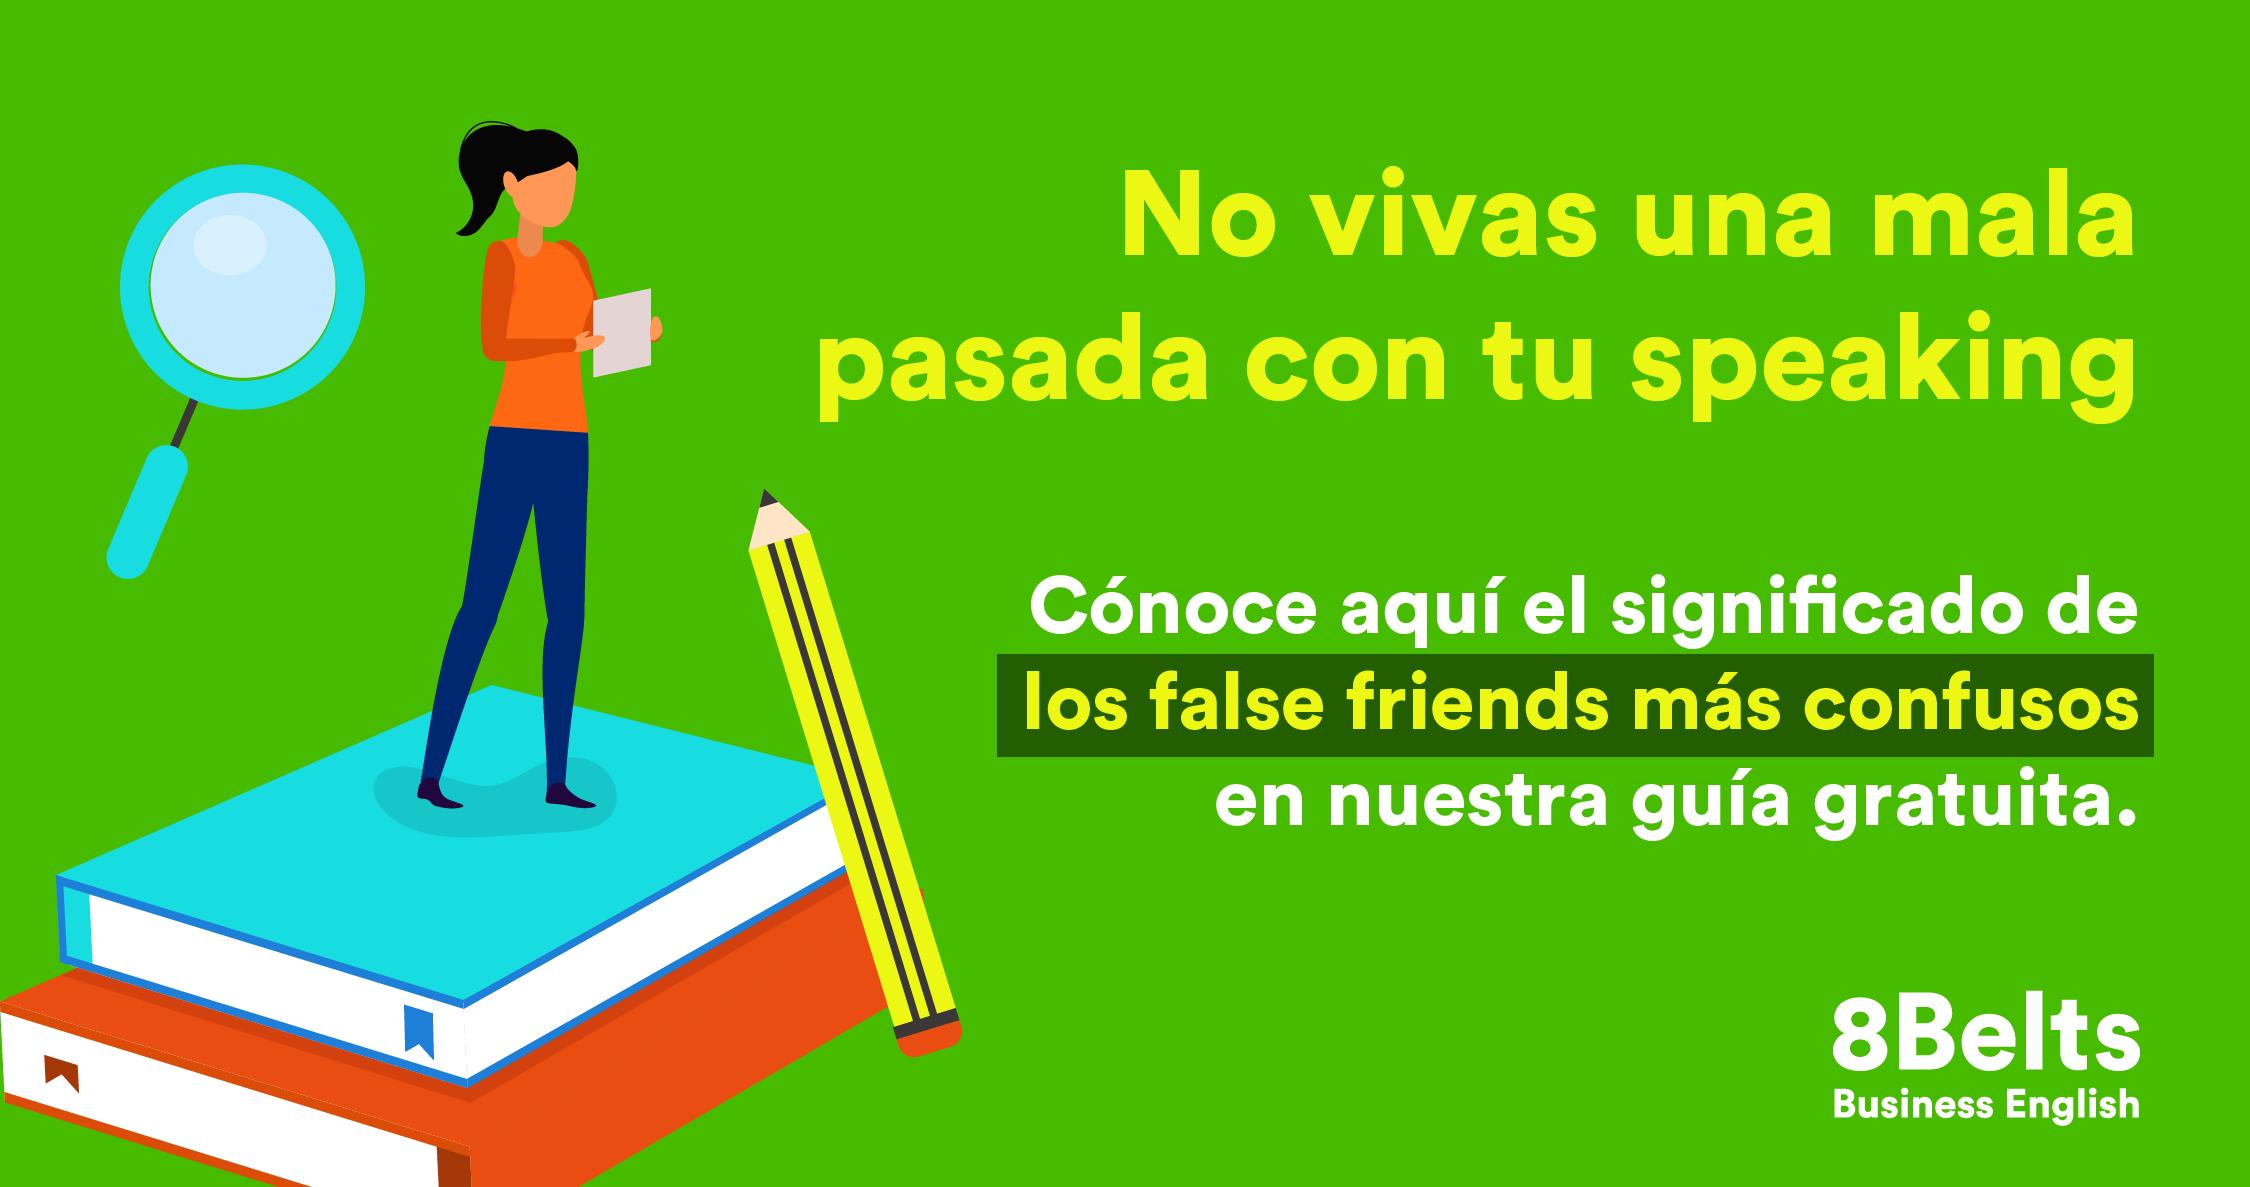 Lista de false friends en inglés- 8belts